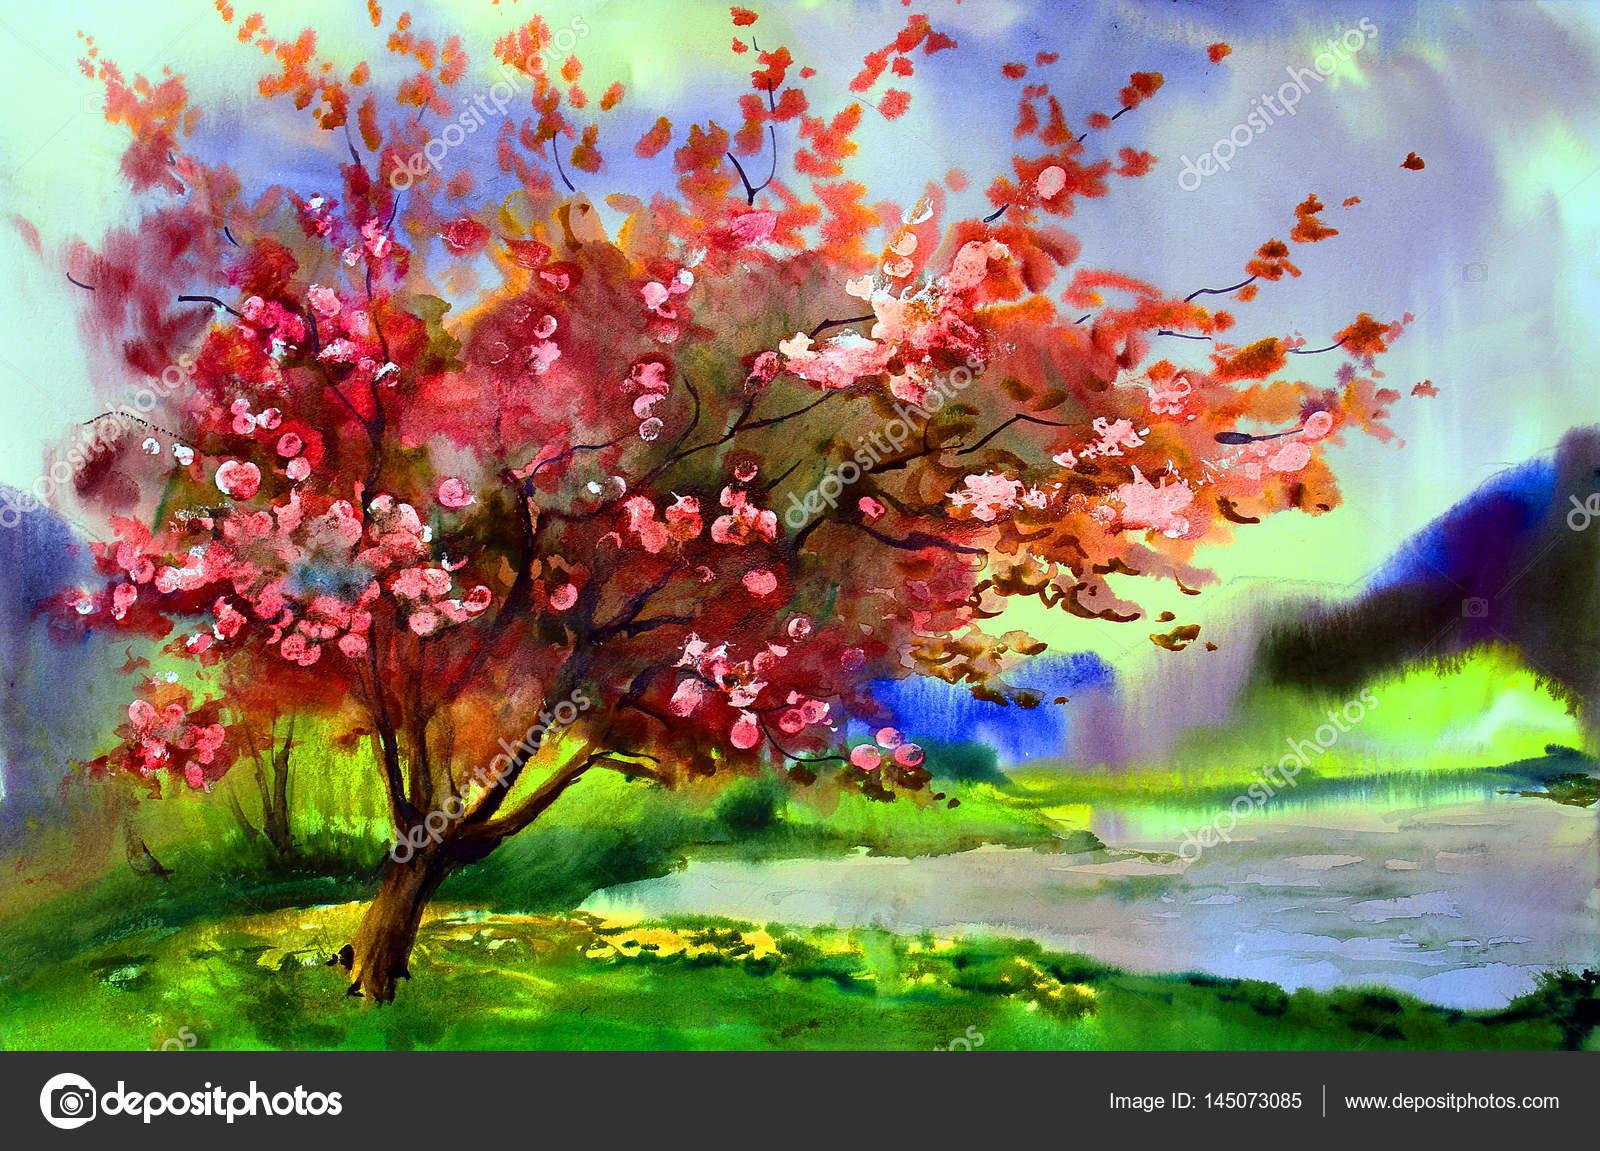 Estremamente Paesaggio Primaverile Albero | Collection 16+ Wallpapers JZ23